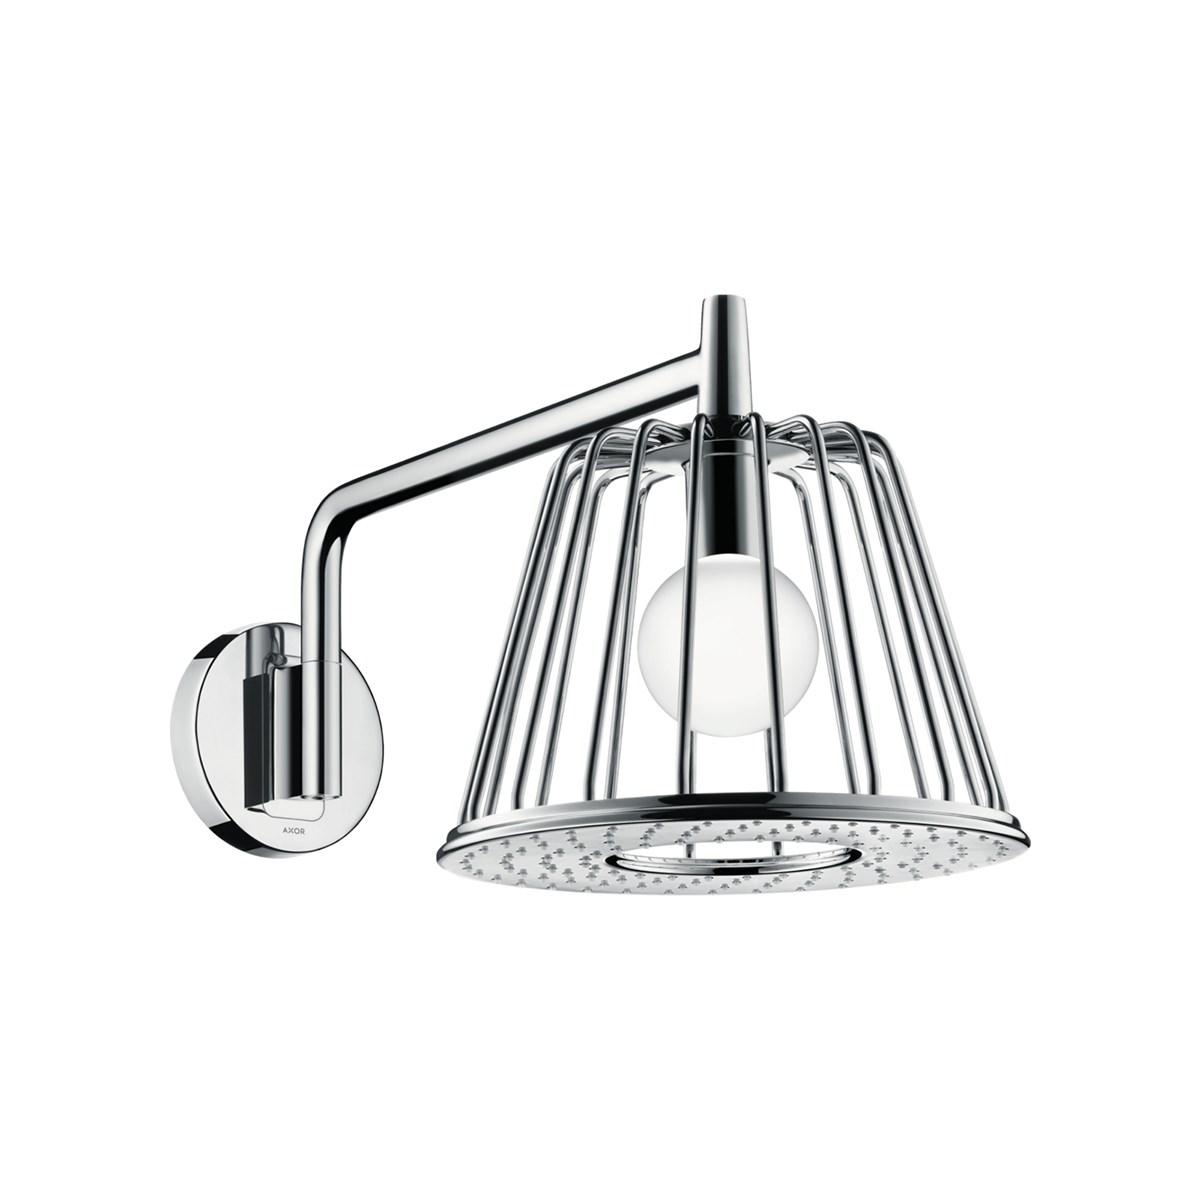 Hansgrohe-Nendo-AXOR-Nendo-LampShower-275-26031000-Matisse-1